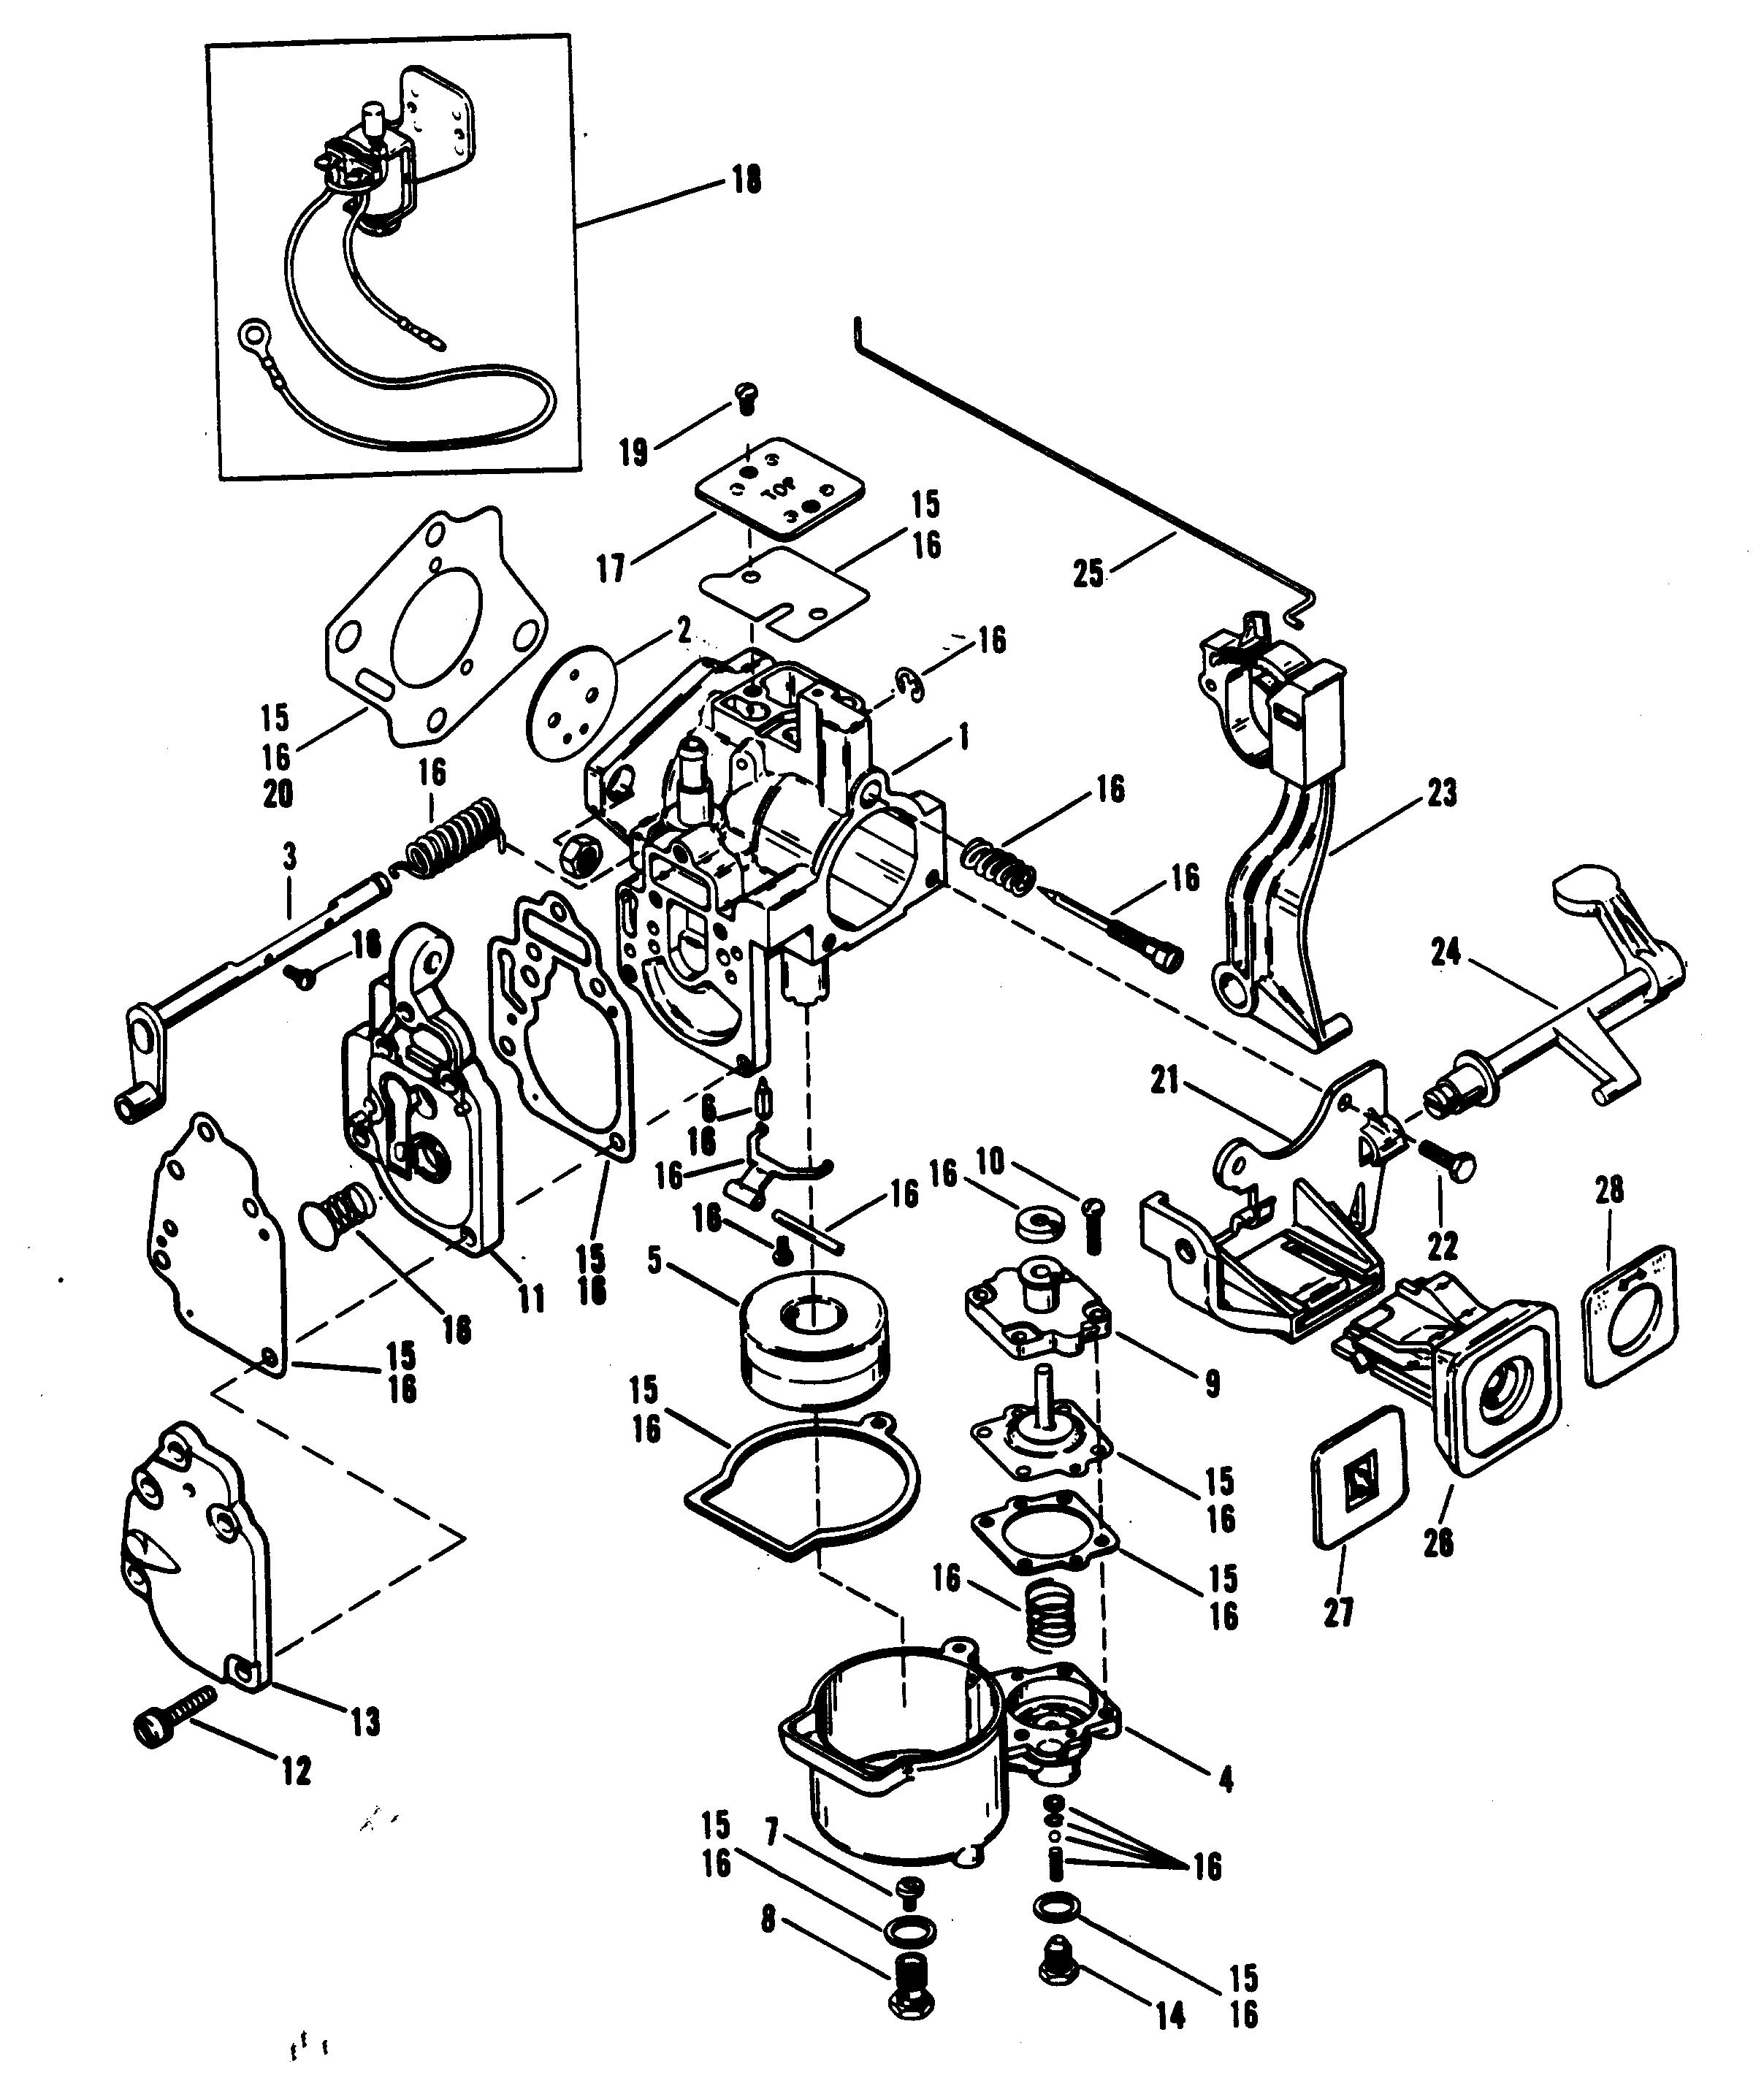 1989 mercury 15 hp outboard parts manual